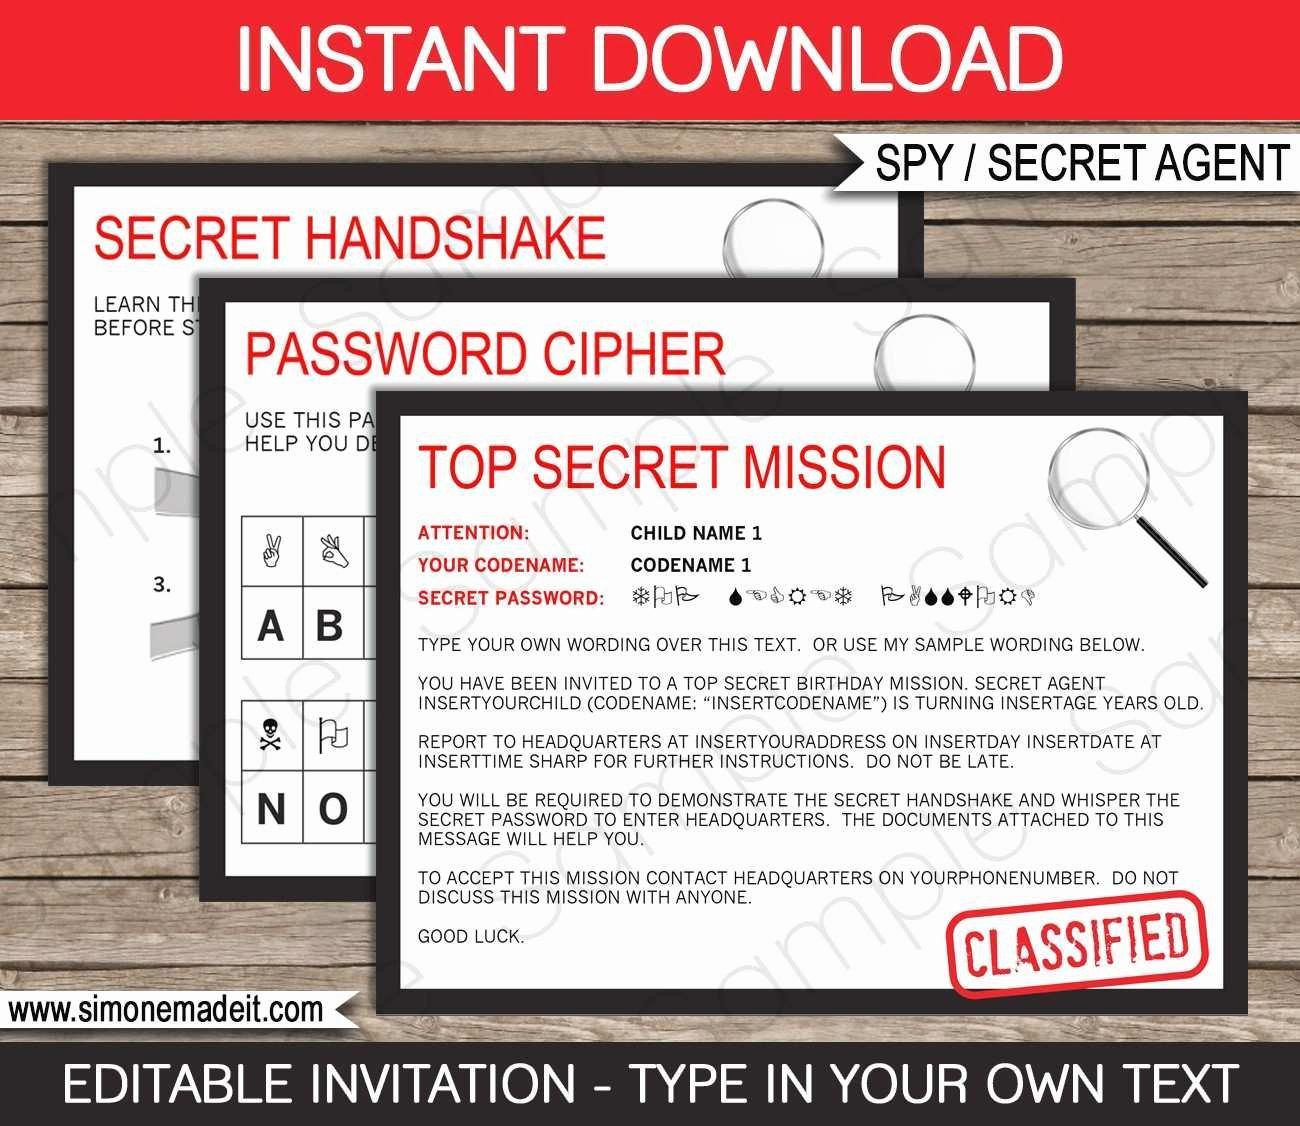 Free Baseball Ticket Template Elegant Baseball Ticket Invitation Template Free Download